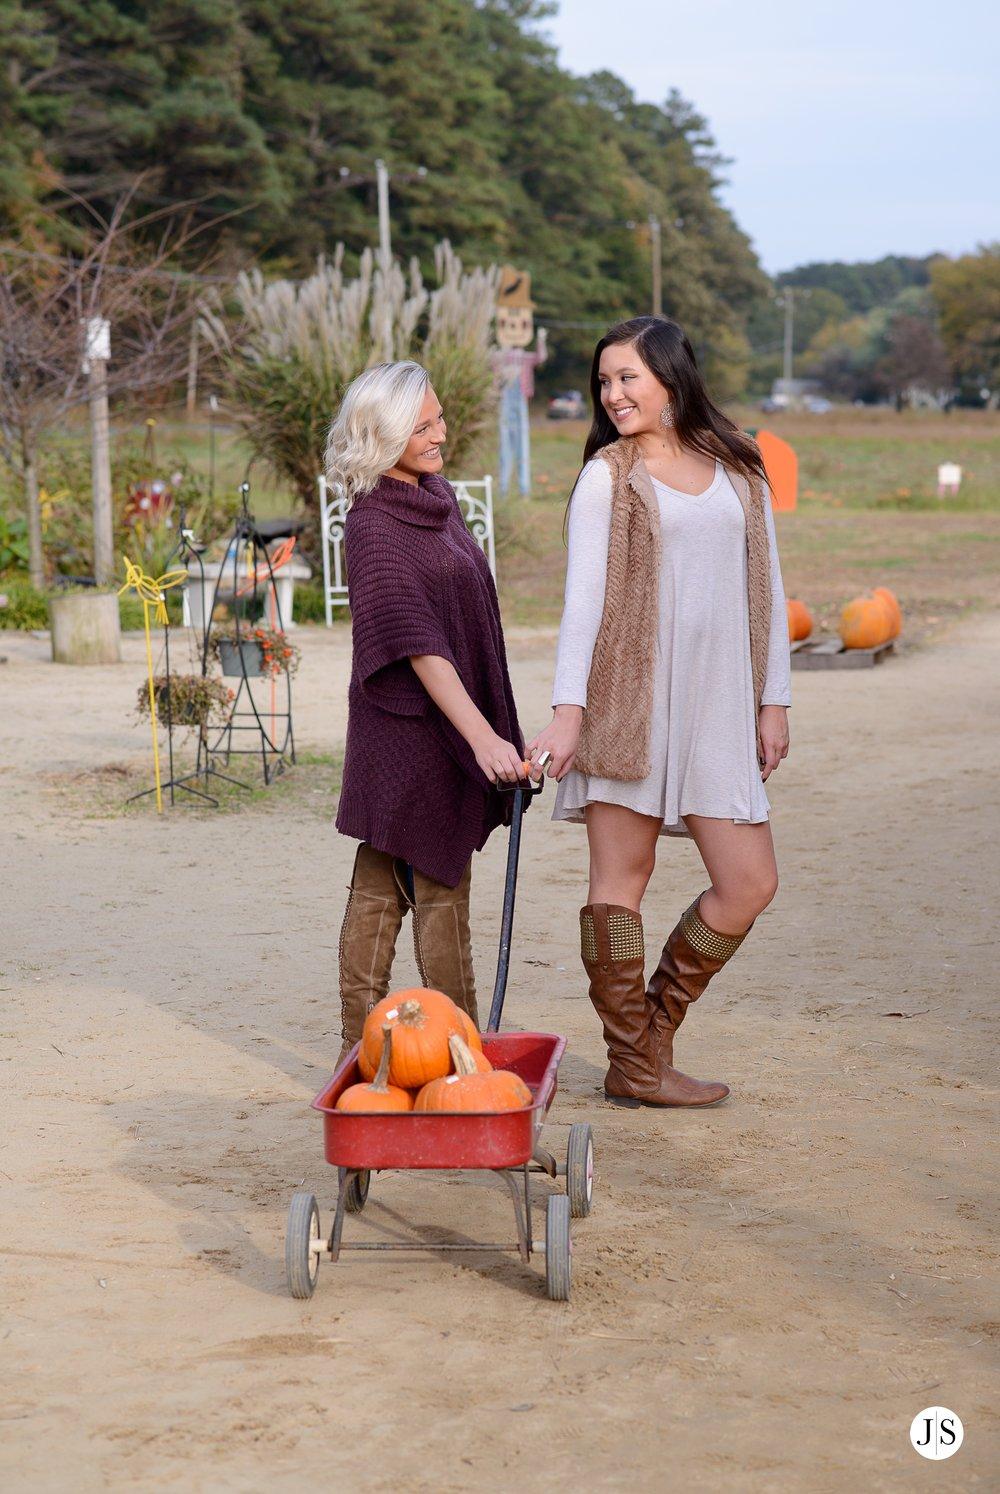 senior-portrait-pumpkins-maryland-adkins-farm-fall-portraits-modelreps-photo 5.jpg